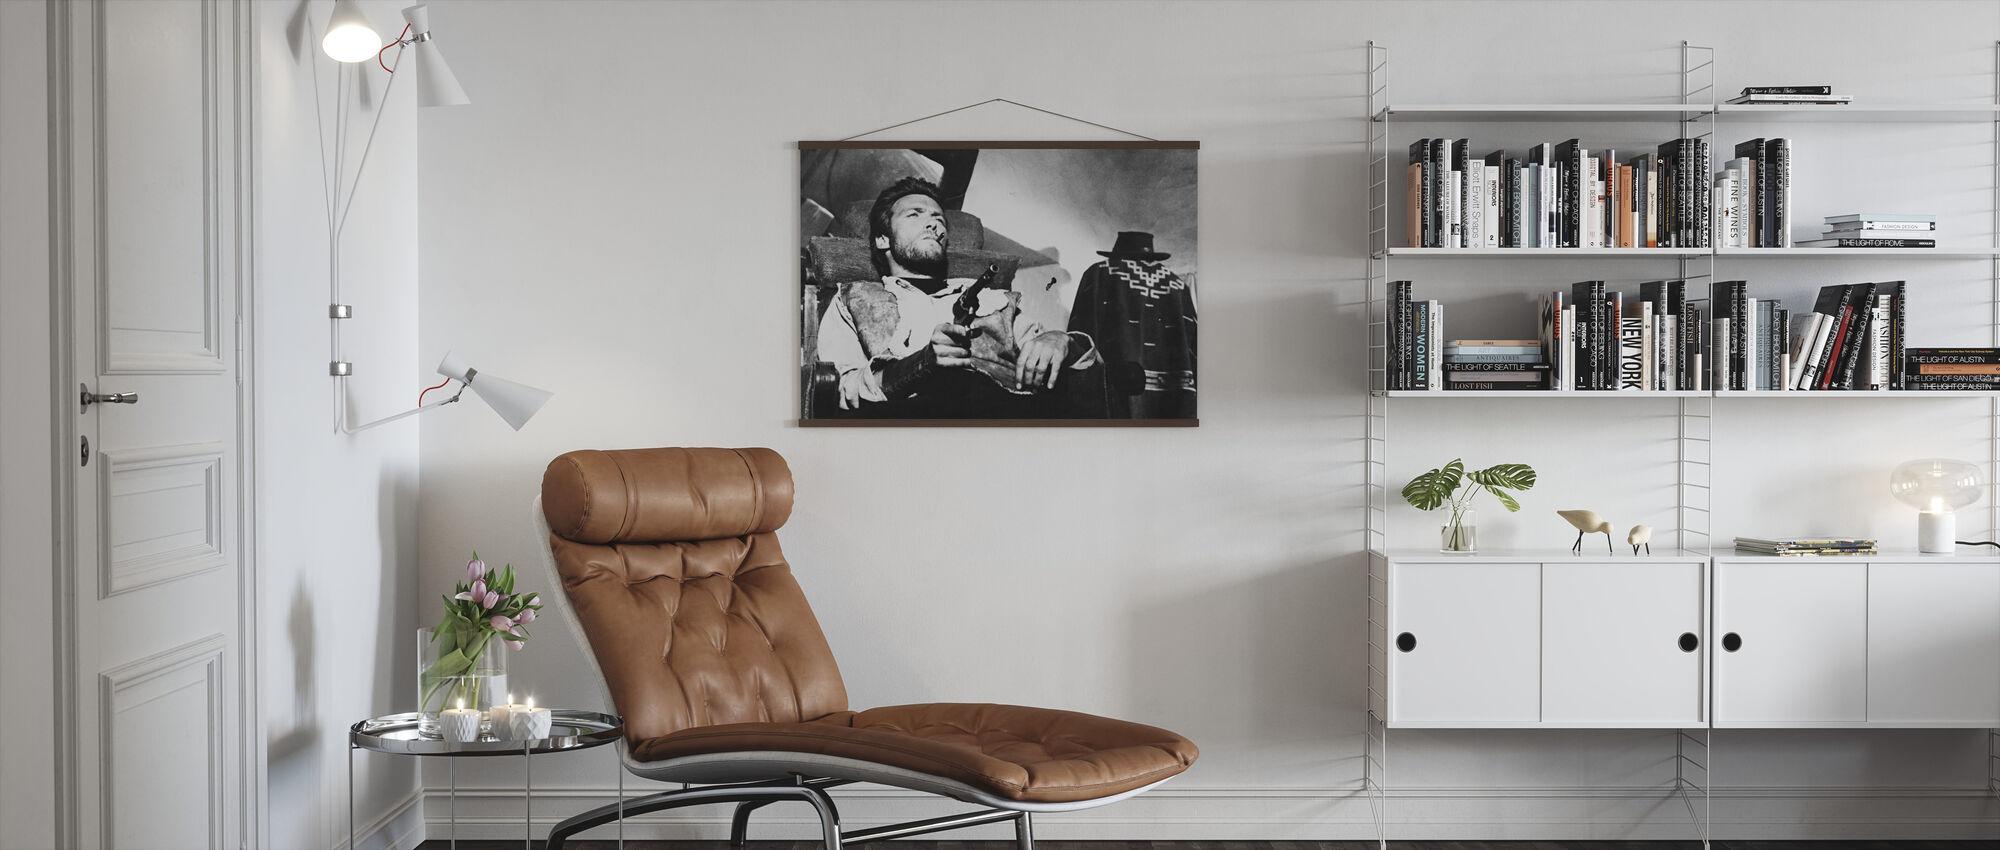 Een paar dollar meer - Clint Eastwood - Poster - Woonkamer